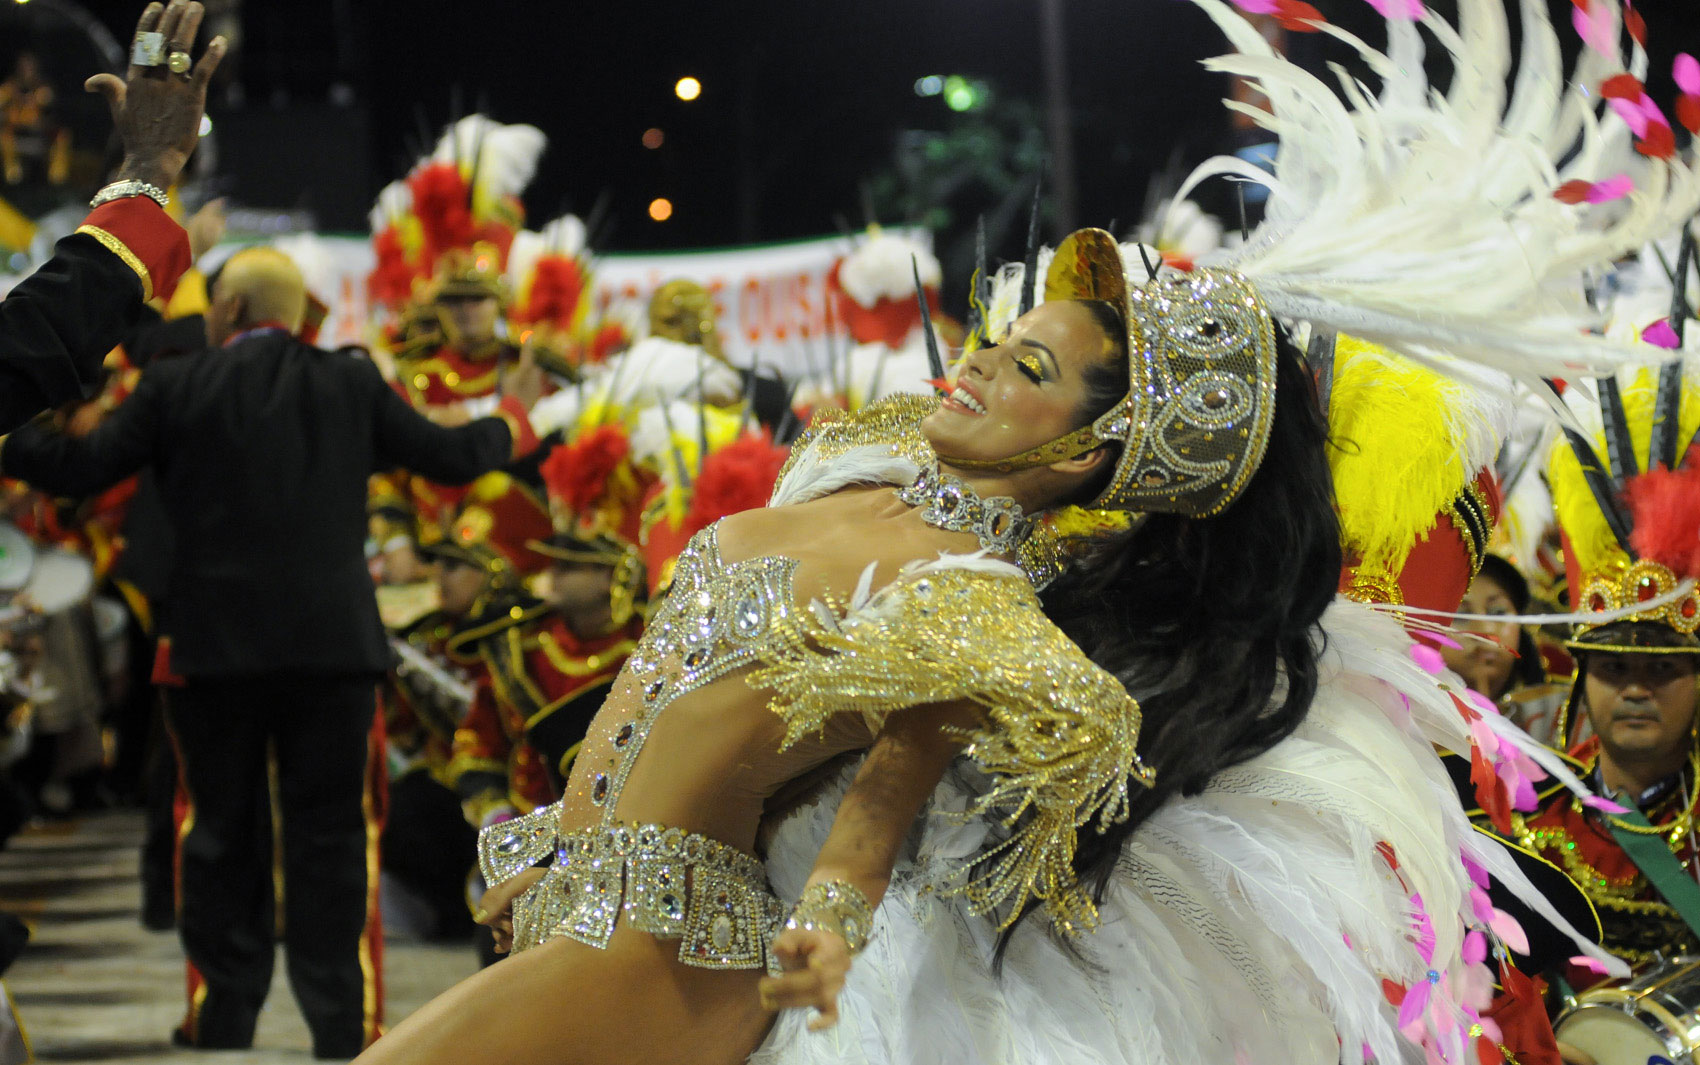 carnaval_de_rio 12.jpg